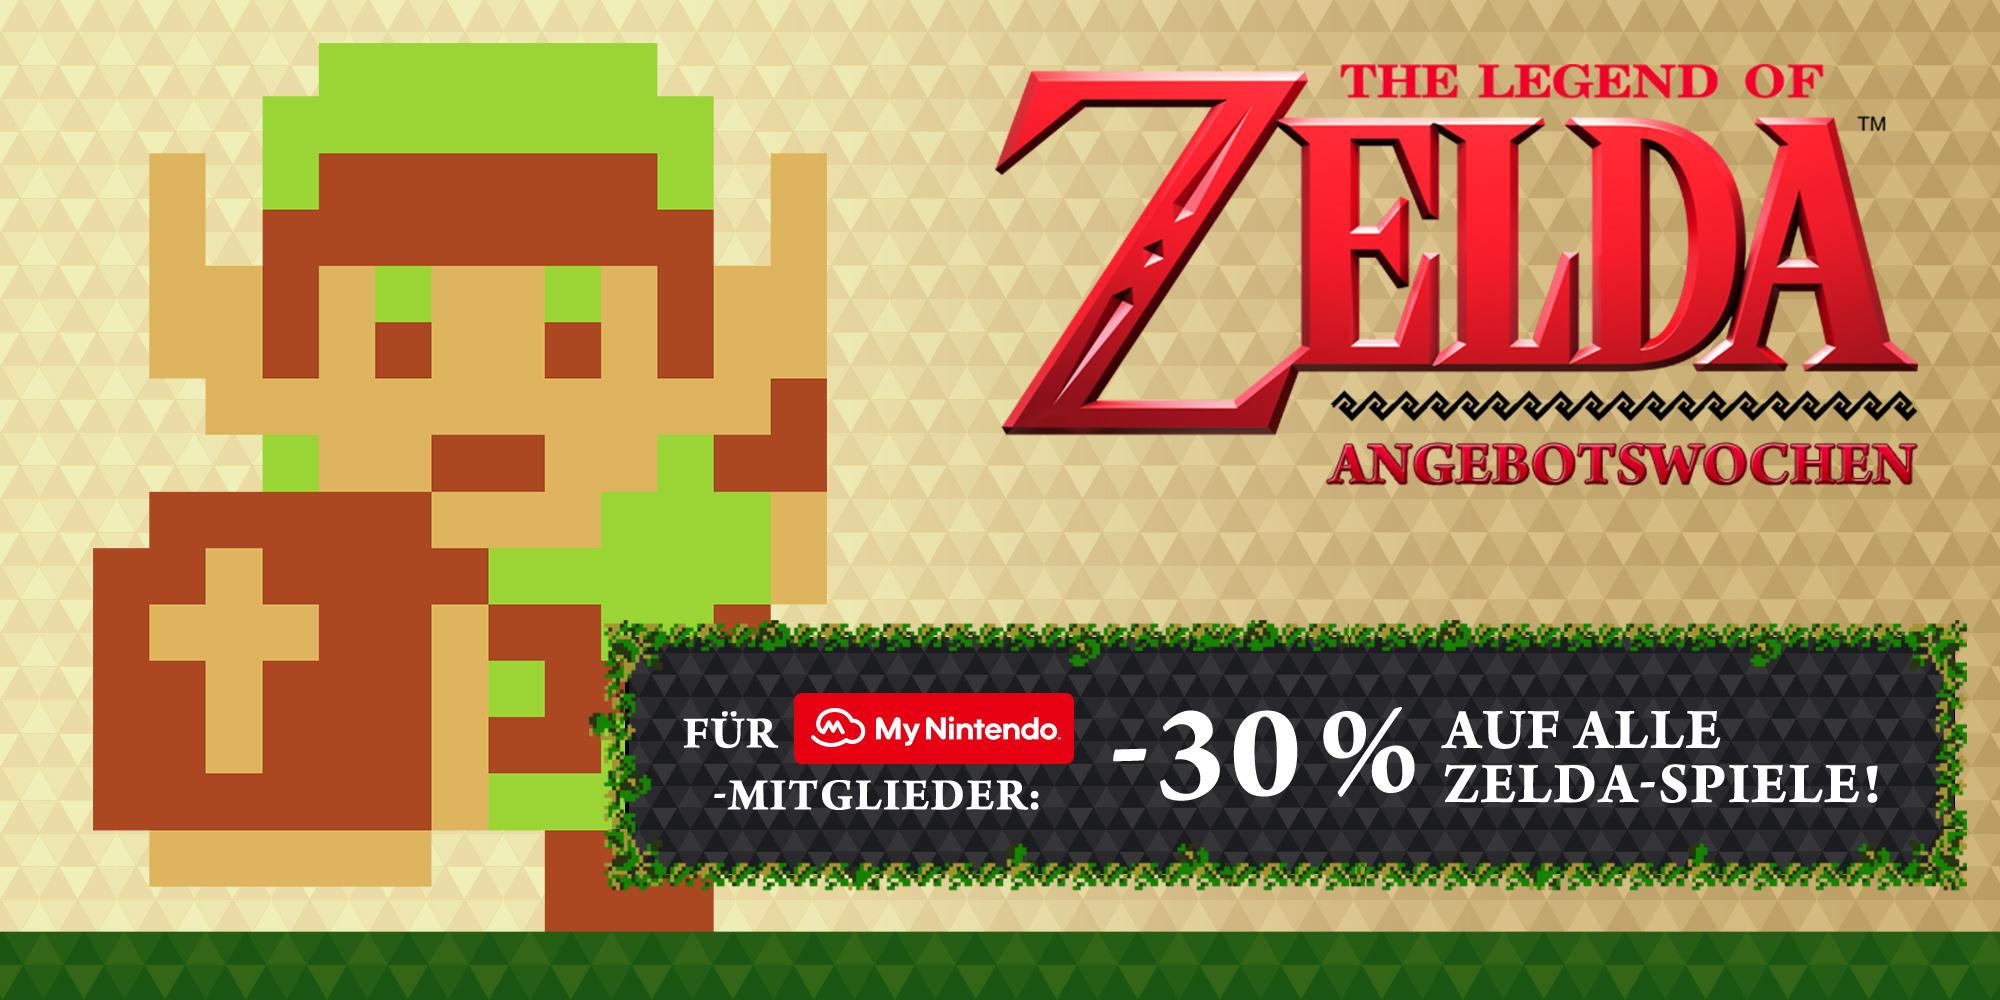 Alle Zelda Titel ab morgen (26.01.) im Nintendo eShop Angebot